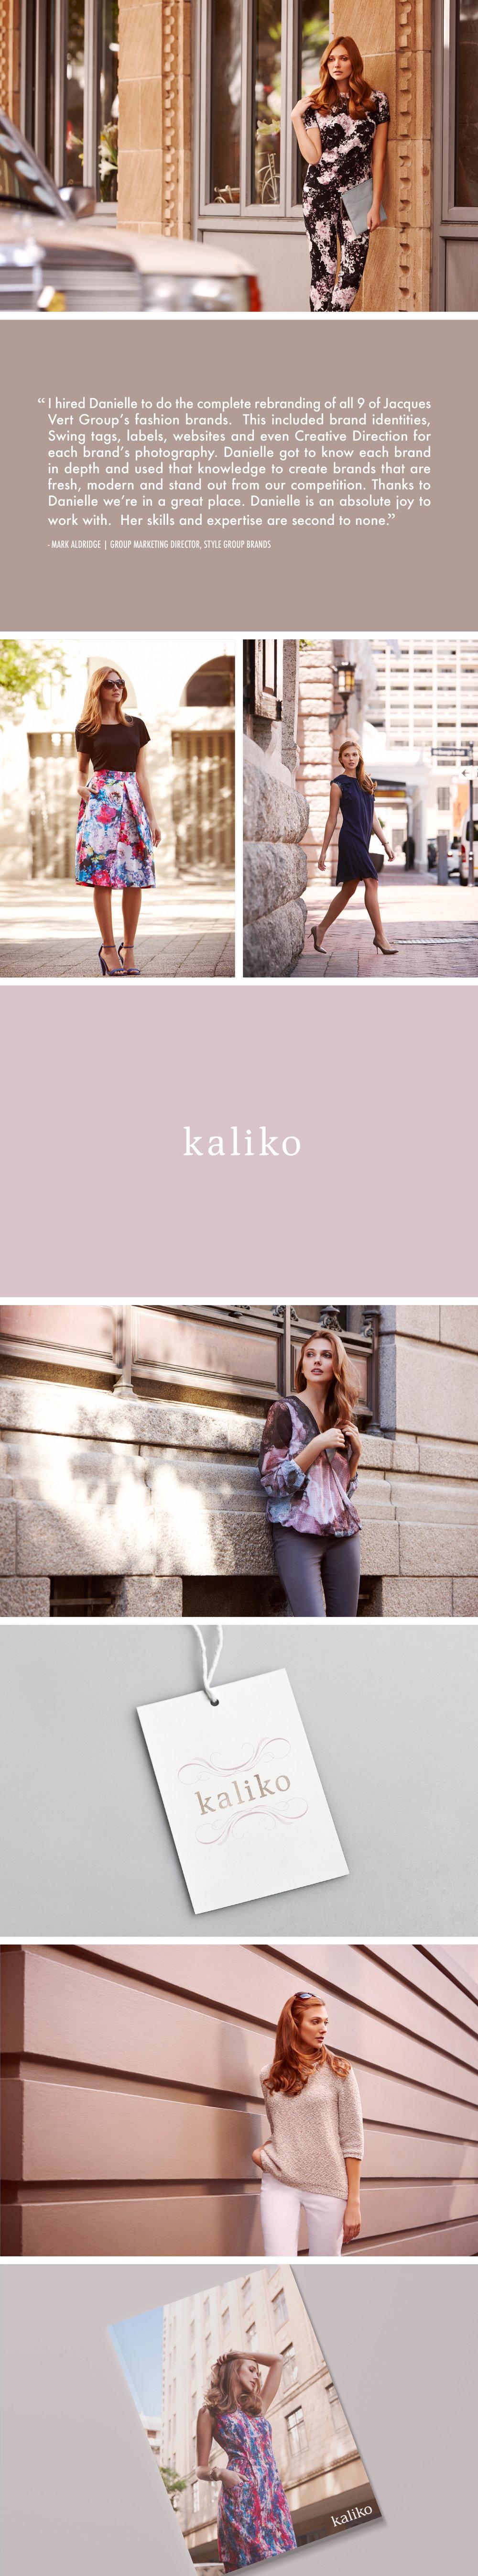 Kaliko Brand Identity.jpg